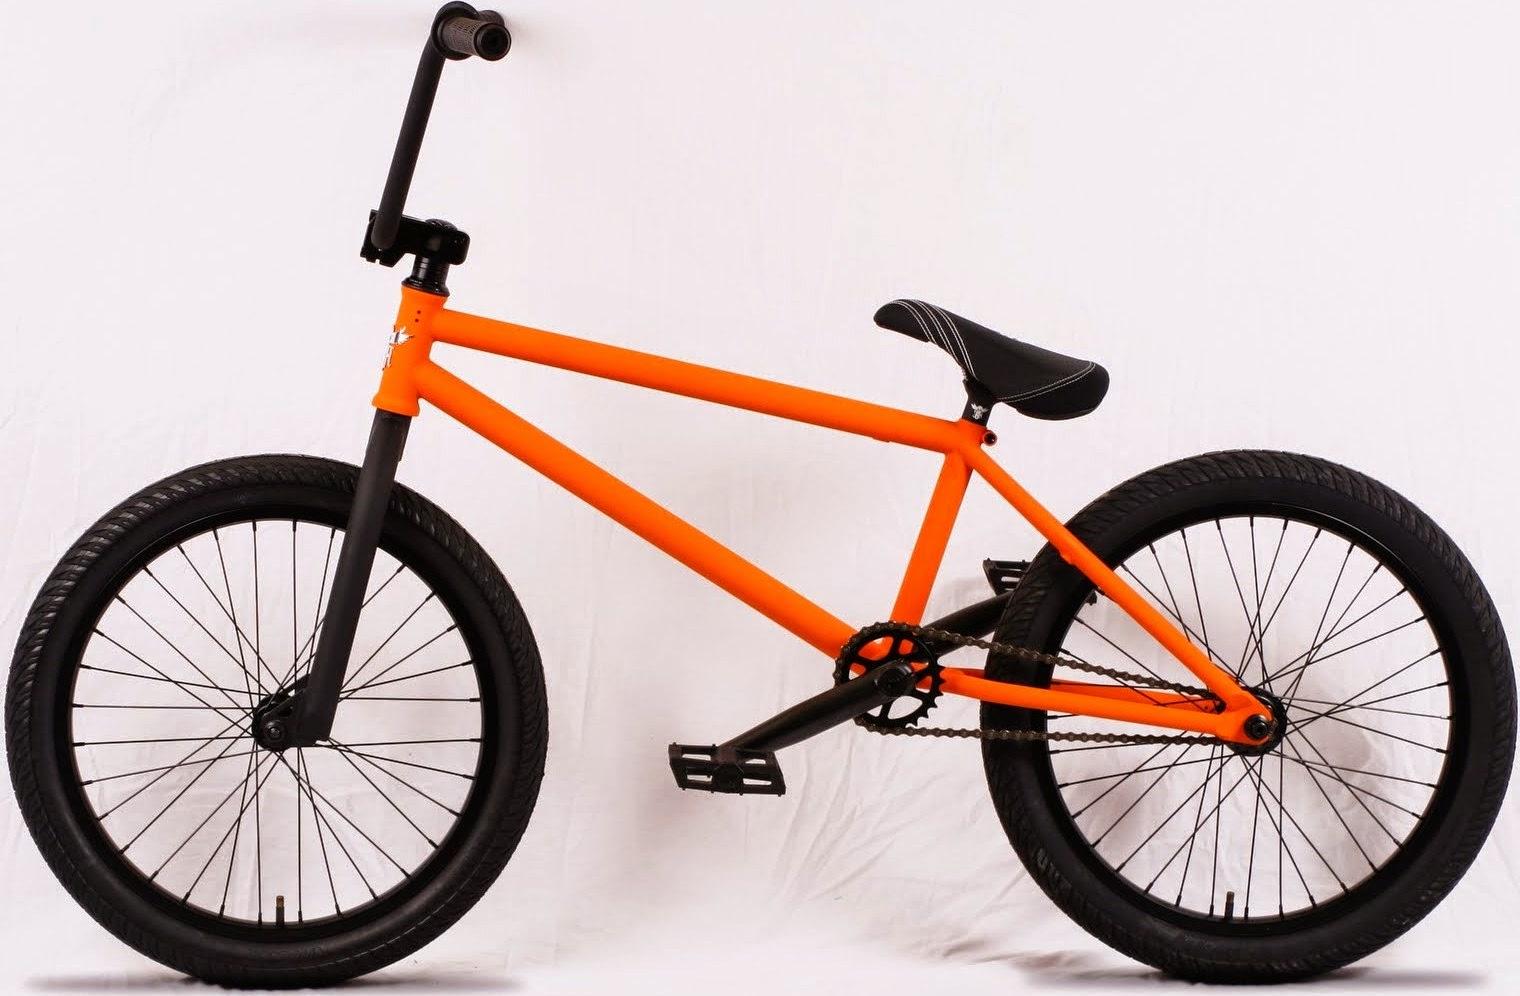 Motor Modifikasi Terkini Modifikasi Sepeda Bmx